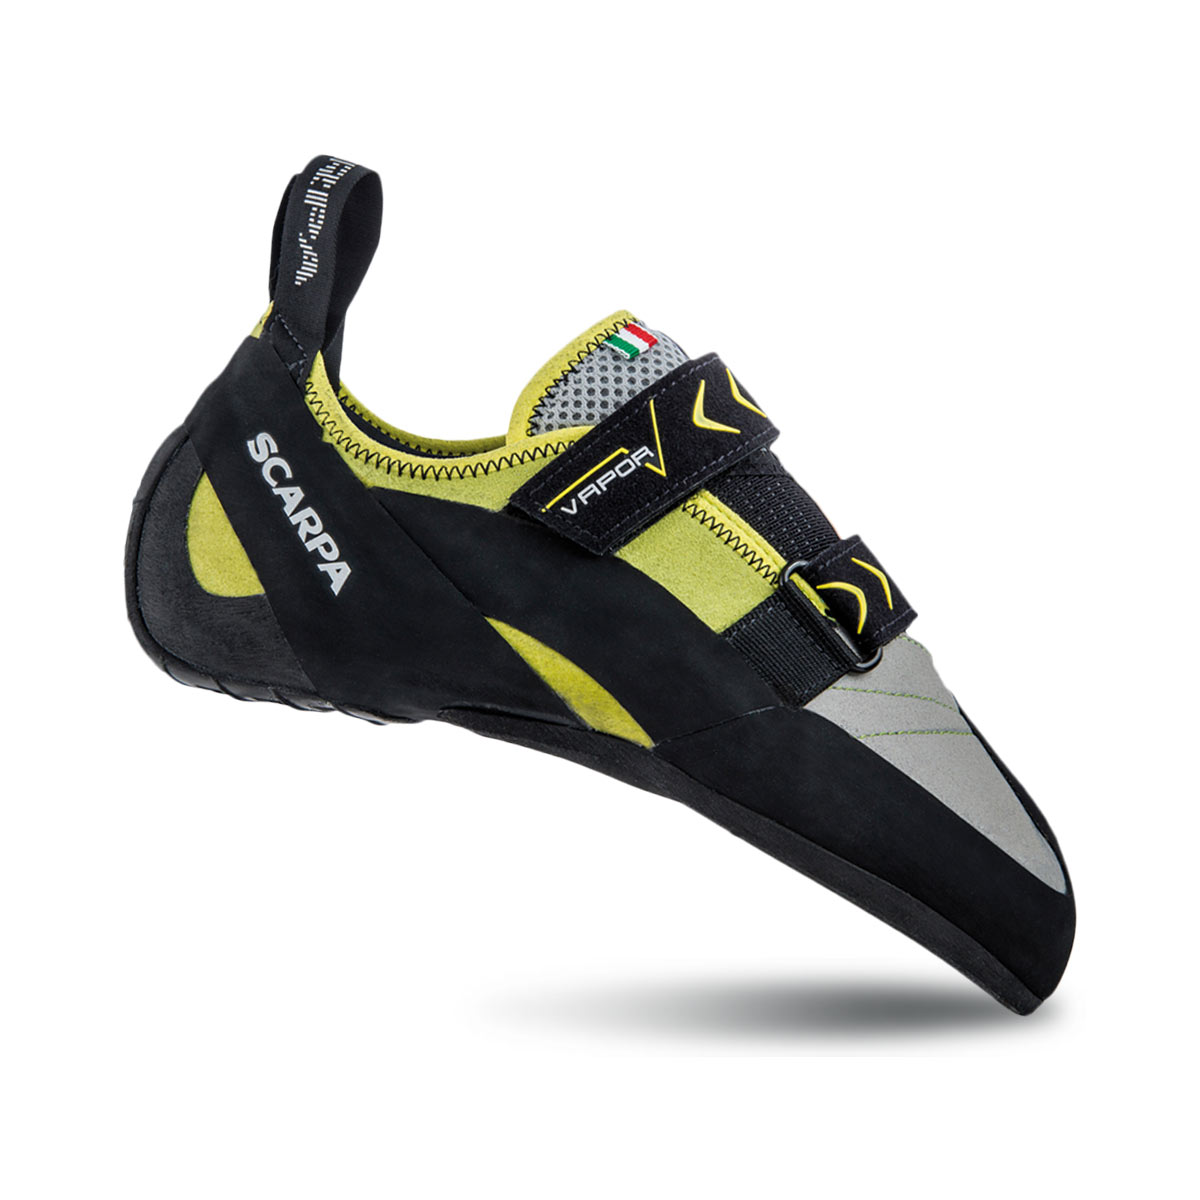 568bdfd76e1c40 Scarpa Vapor V Climbing Shoe - Last season